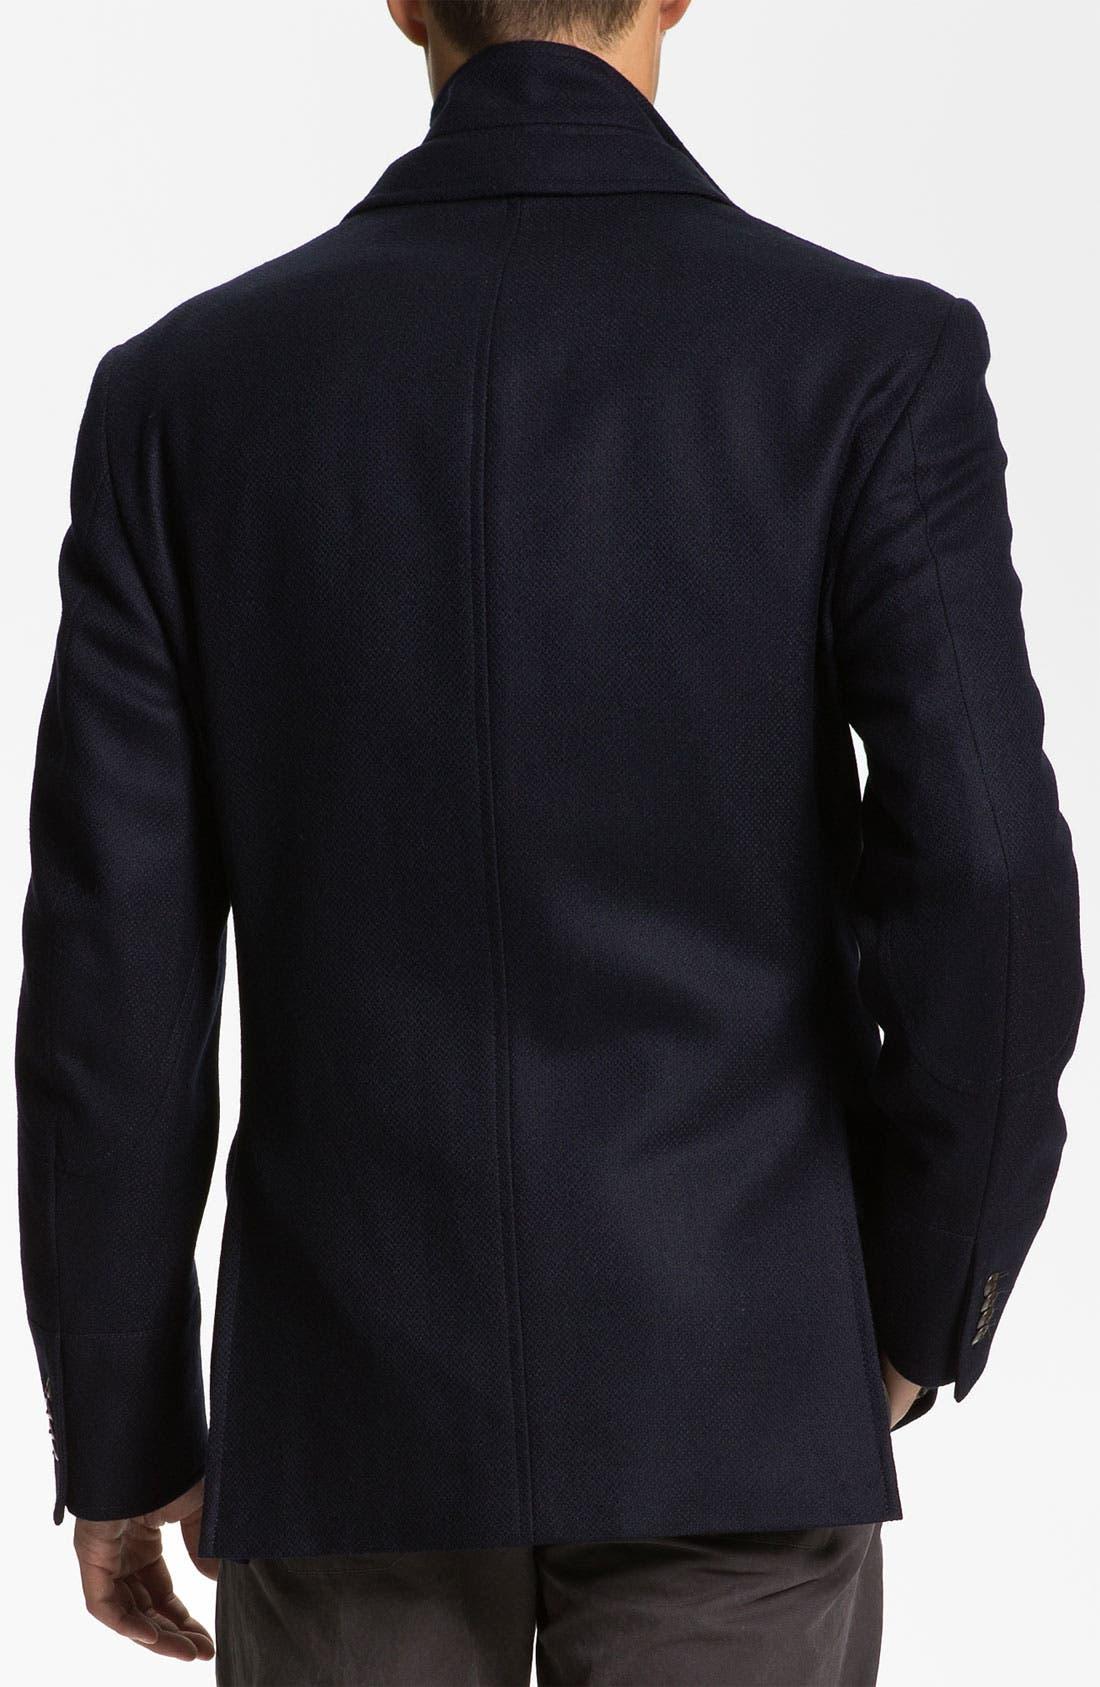 Alternate Image 2  - Kroon 'Ritchie' Wool & Cashmere Blazer Style Coat